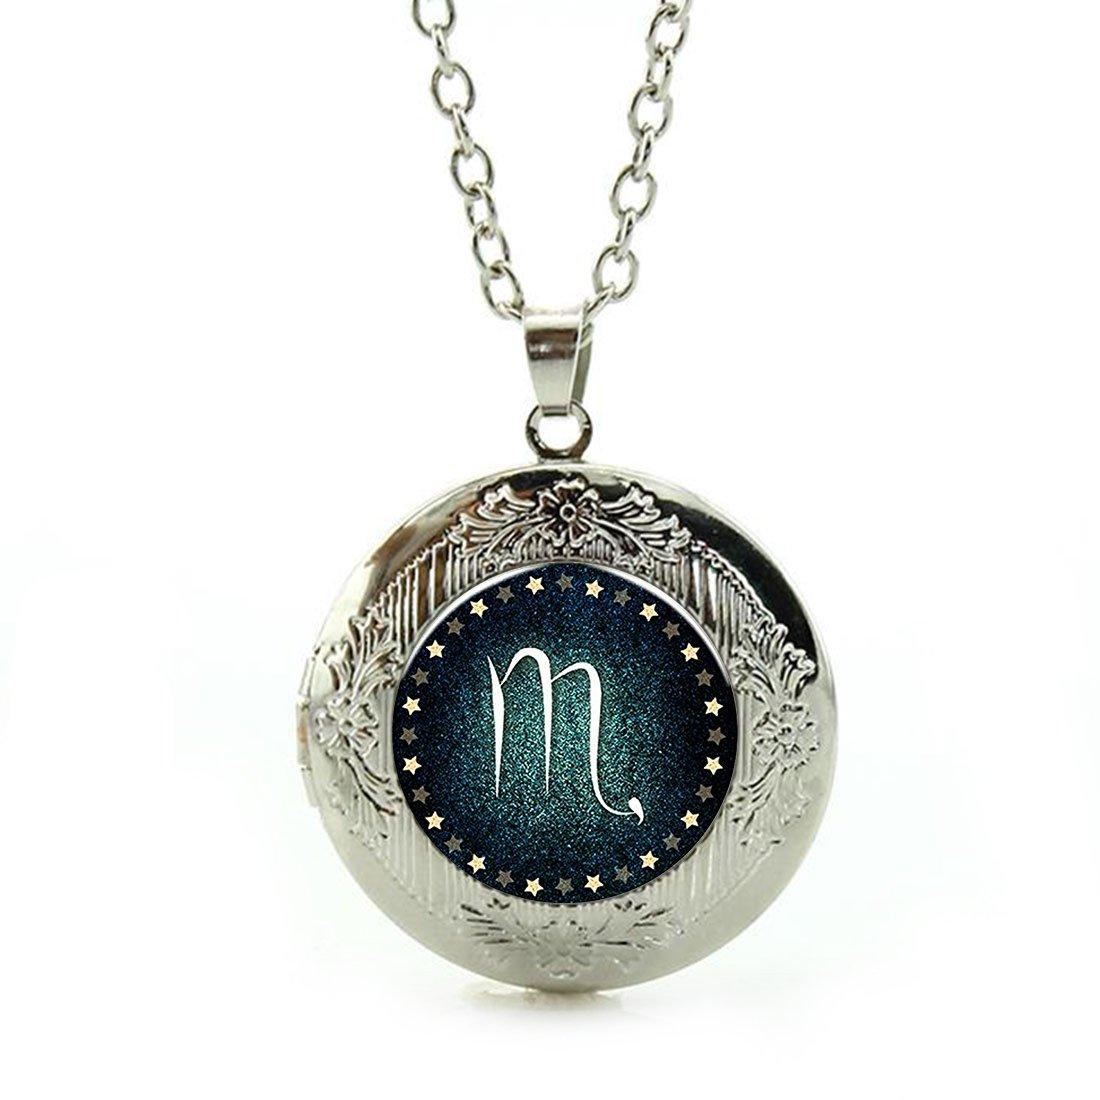 Women's Custom Locket Closure Pendant Necklace Scorpio Birthday Jewelry Included Free Silver Chain, Best Gift Set